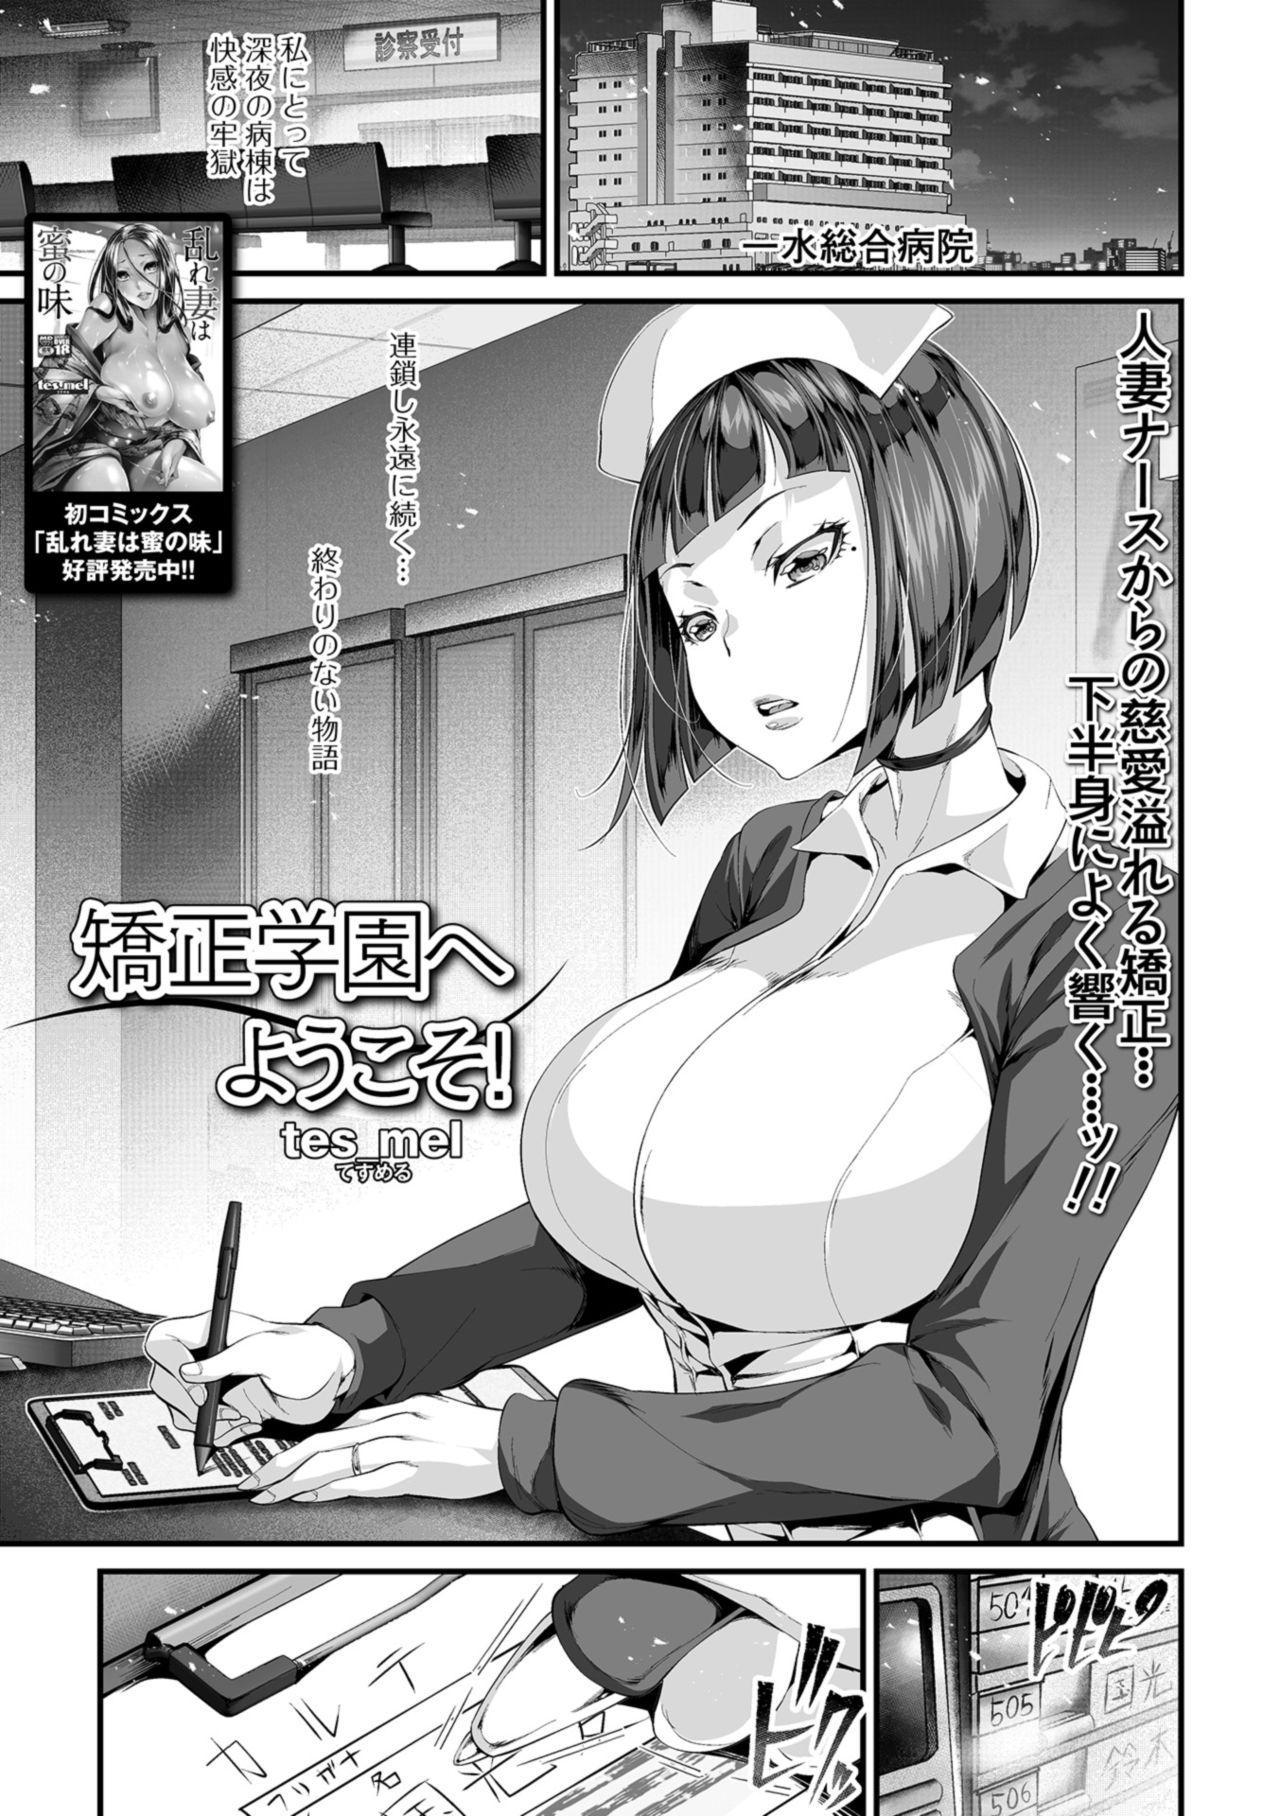 COMIC Shigekiteki SQUIRT!! Vol. 09 40